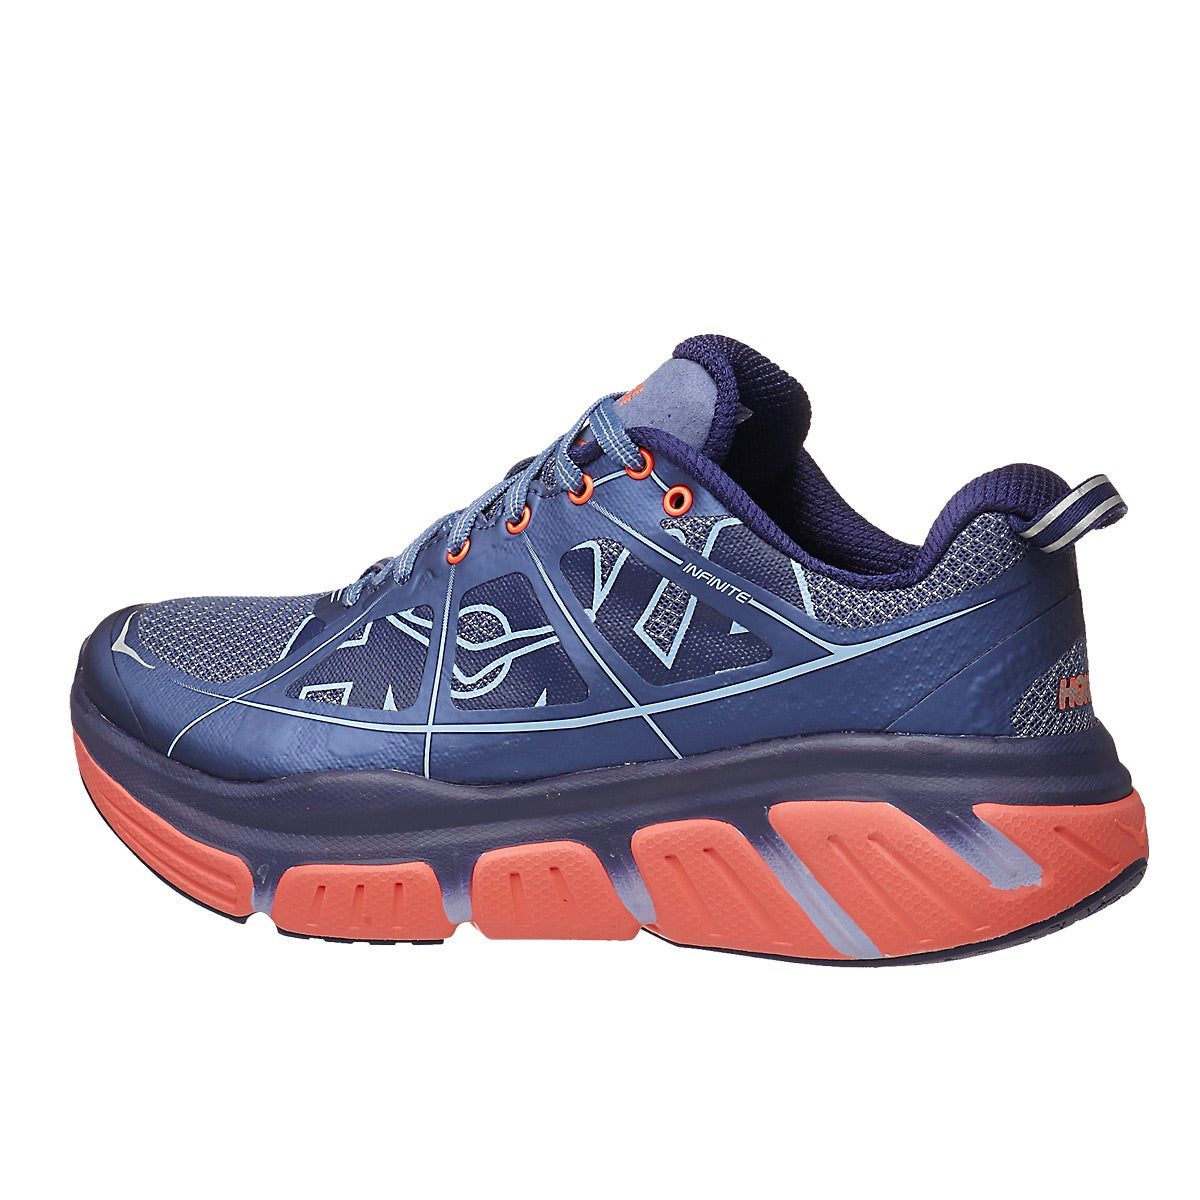 Hoka One One Infinite Women S Shoes Fjord Neon Coral